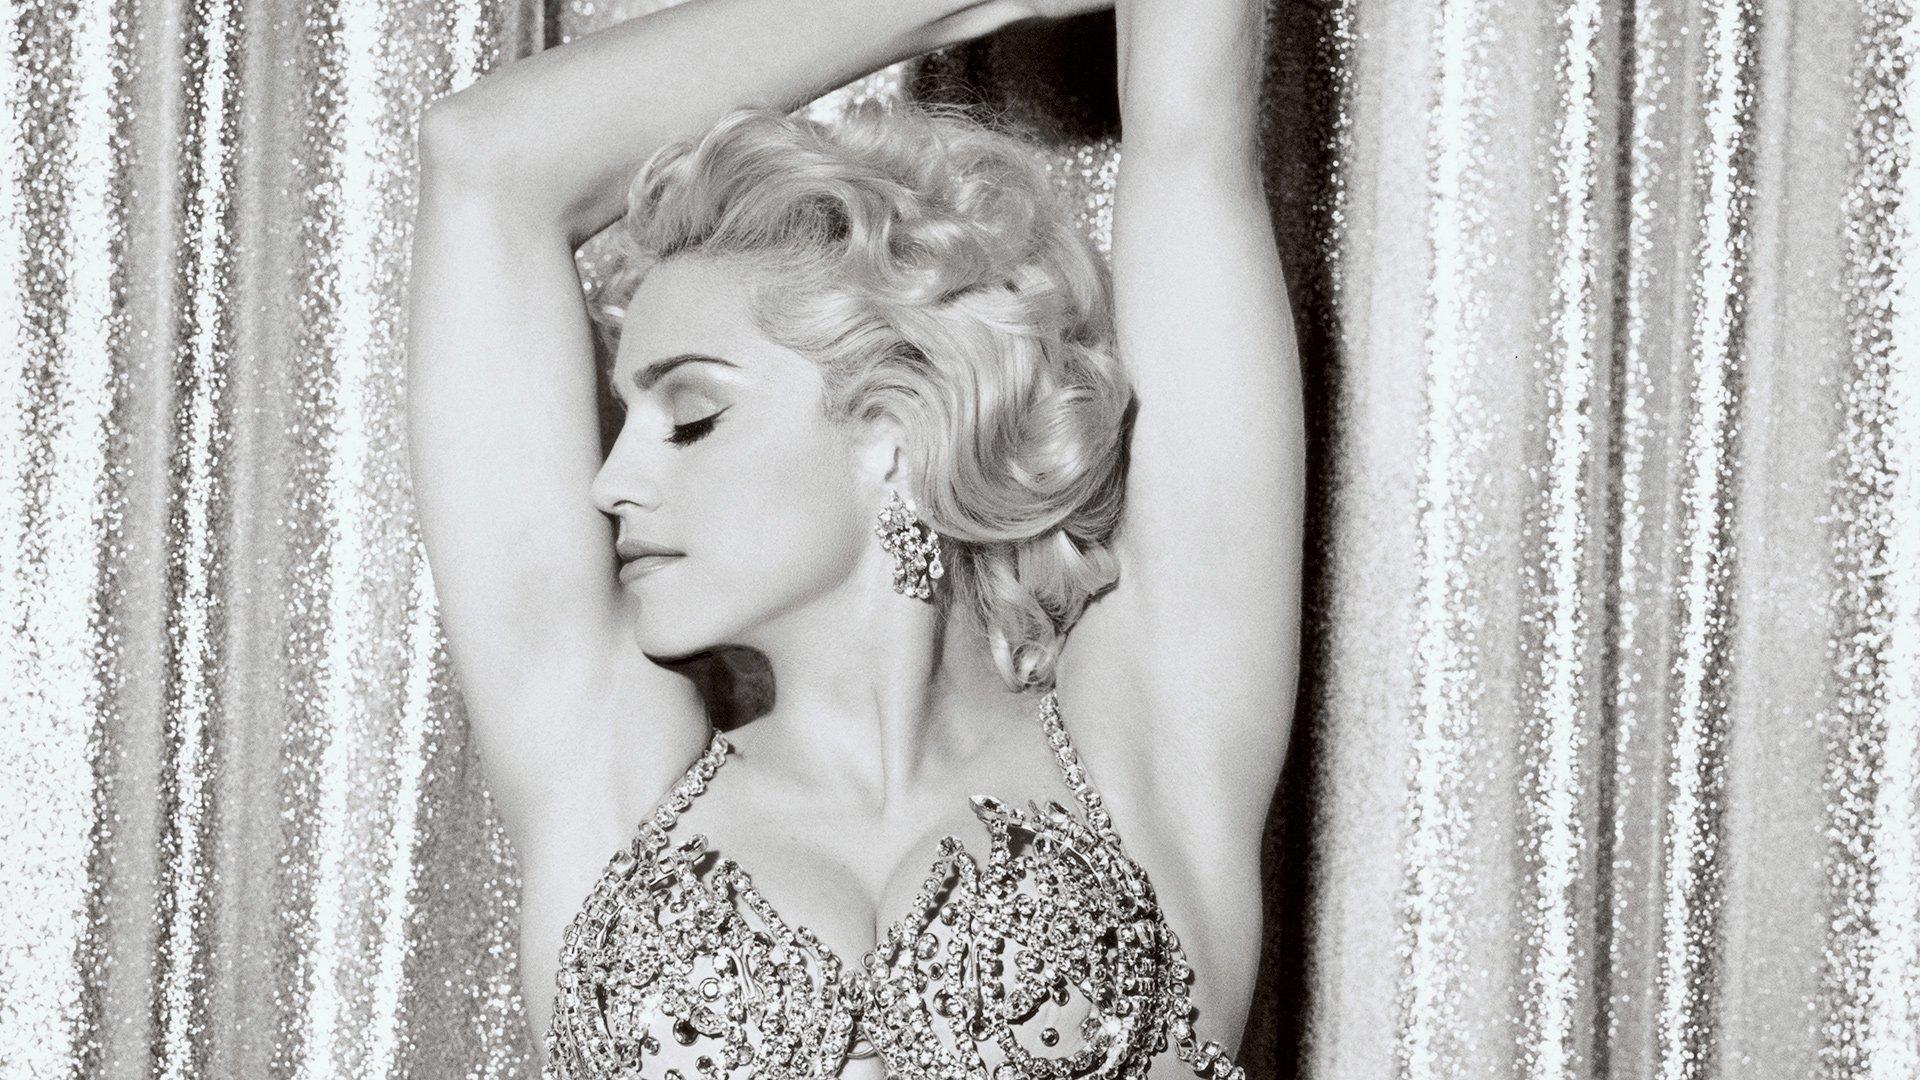 Madonna hd wallpaper background image 1920x1080 id 545496 wallpaper abyss - Madonna hd images ...